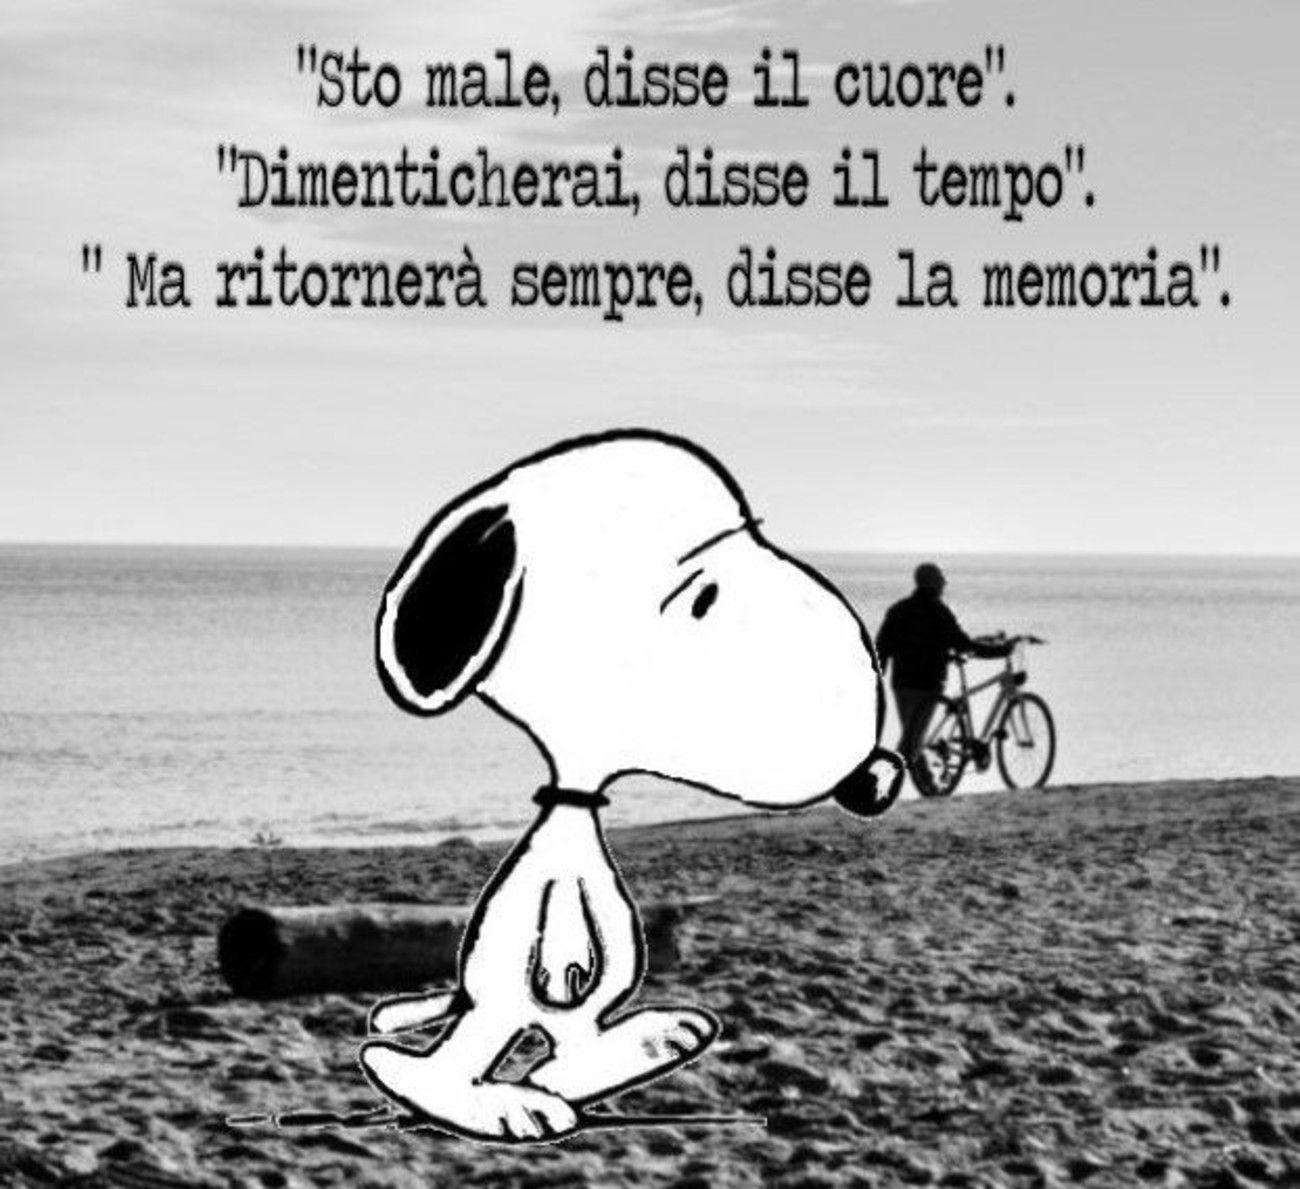 Immagini Di Snoopy Per Whatsapp Immaginifacebookit